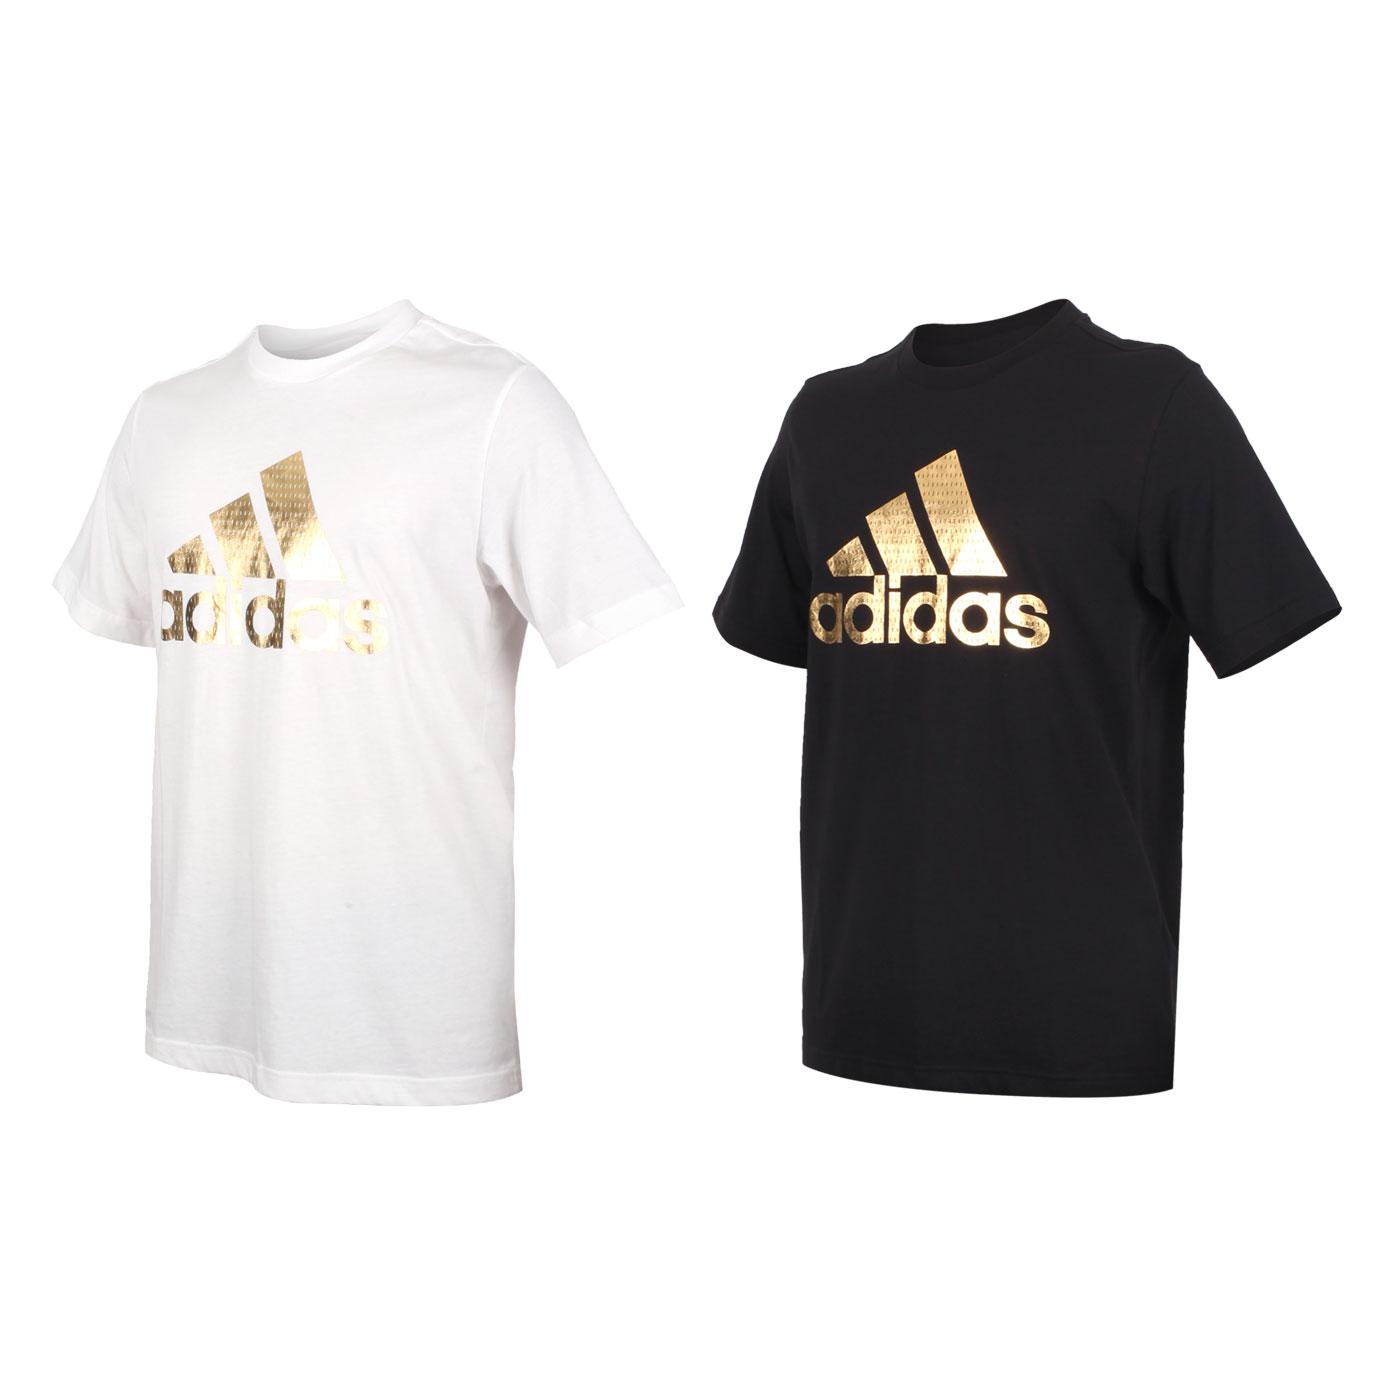 ADIDAS 男款短袖T恤 GE4688